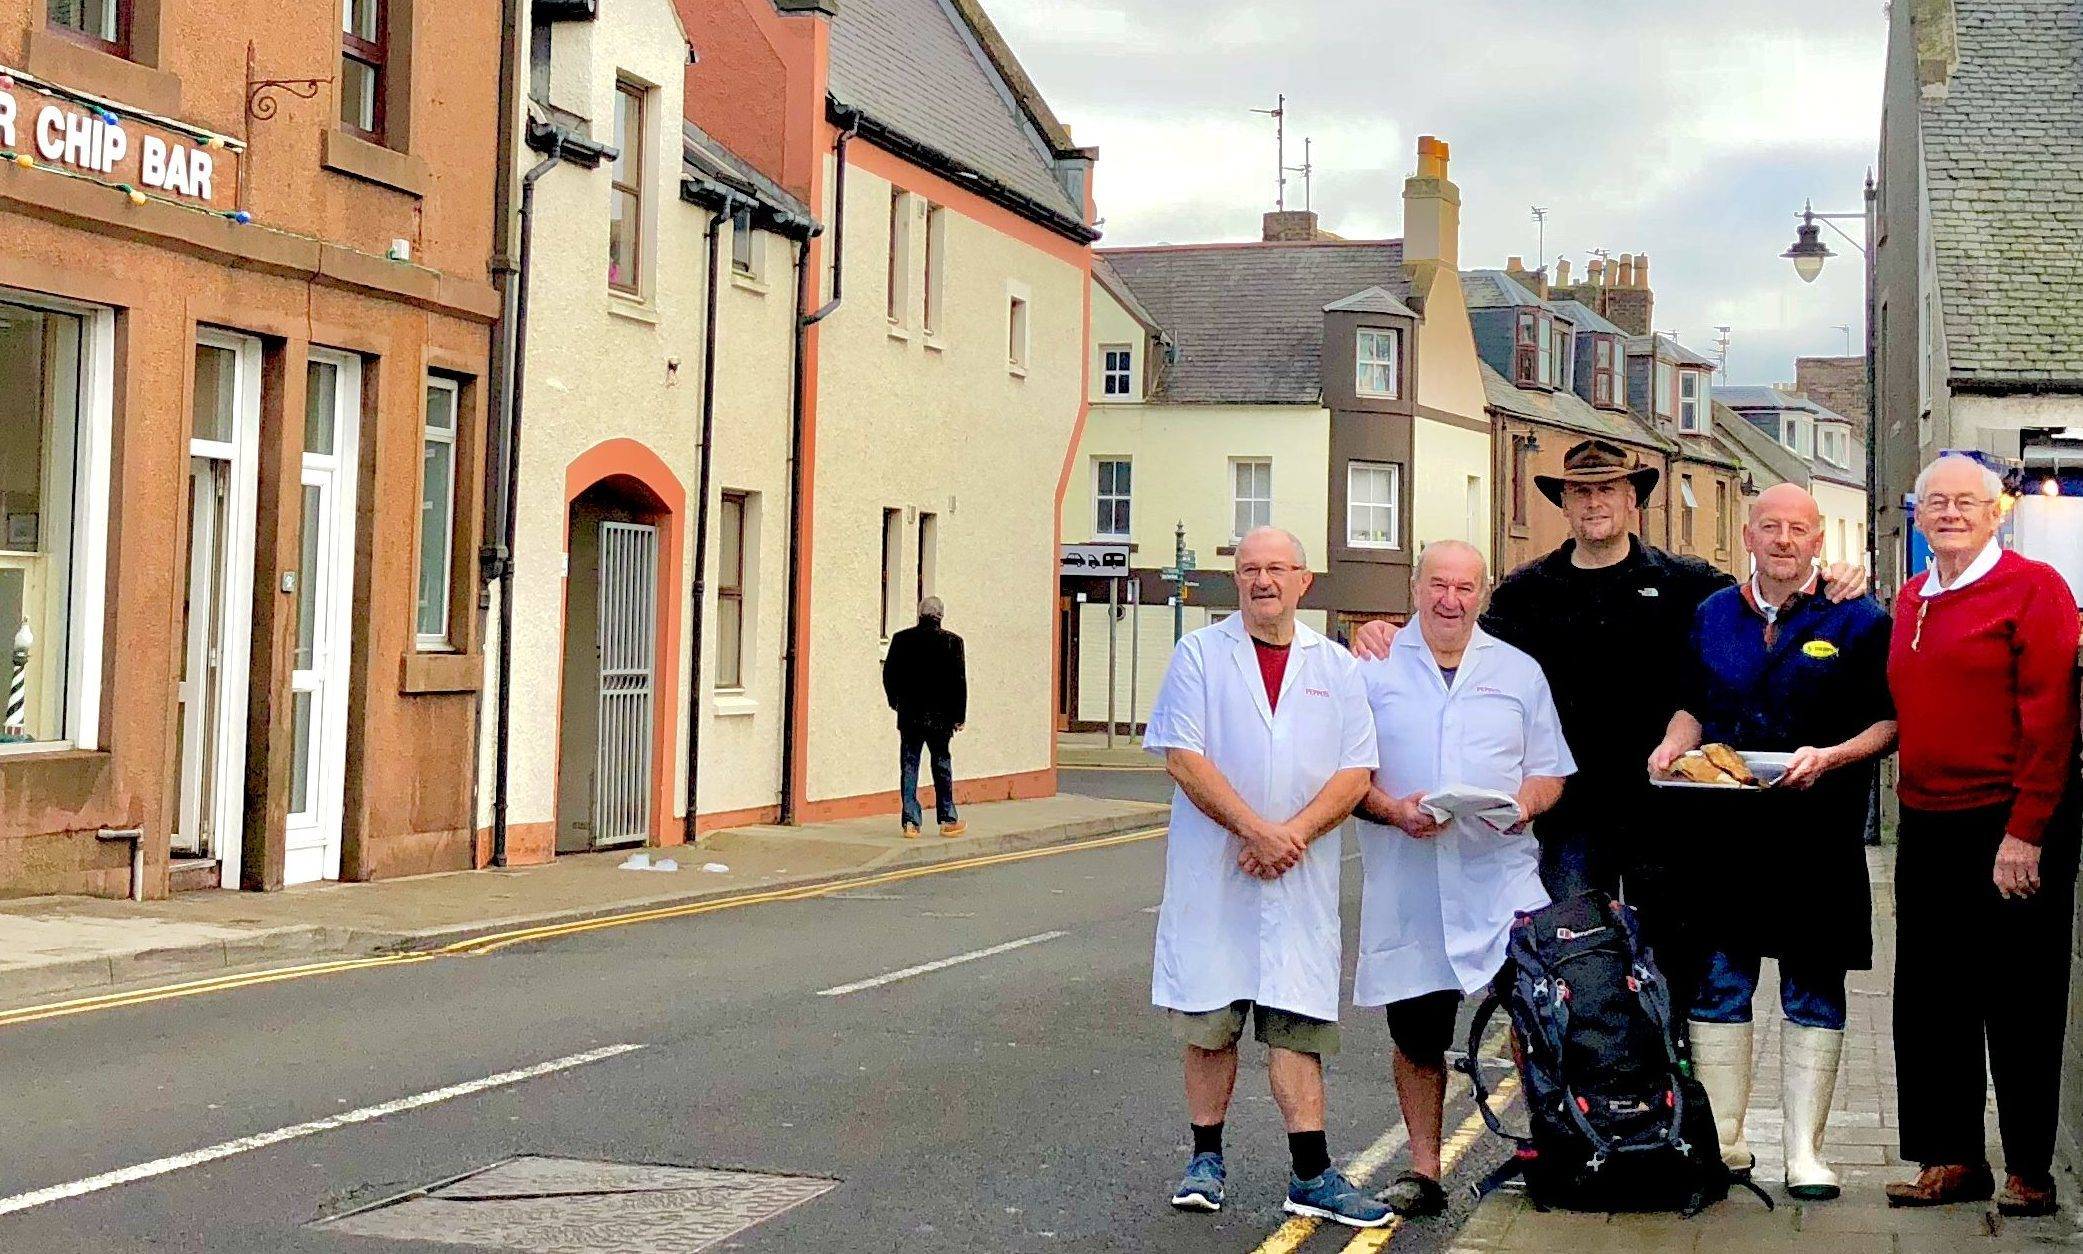 From left, Frank and Johnny Orsi (Peppo's), Caledonian Cowboy, Stuart Scott (Stuart's Fresh Fish) and Mr Rob Johnston (landlord of Osborne Guest House, and scramble egg master).